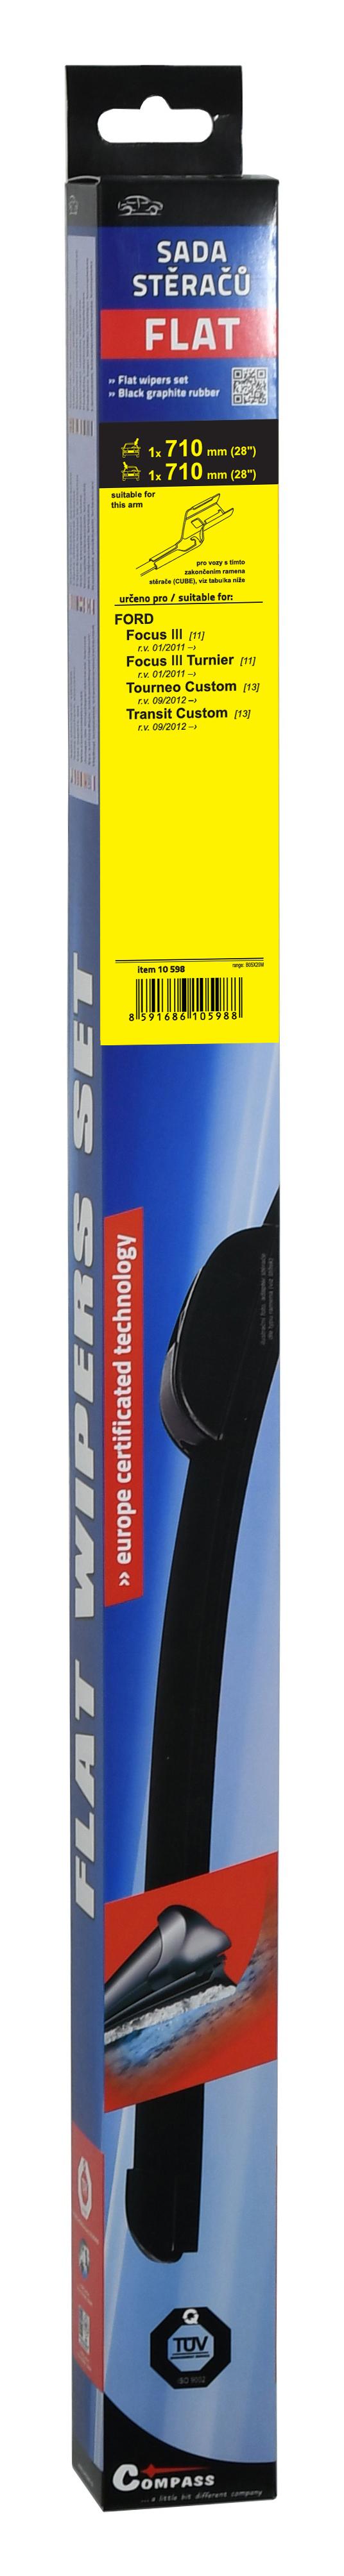 Stěrače FLAT SET (CUBE) 710+710mm